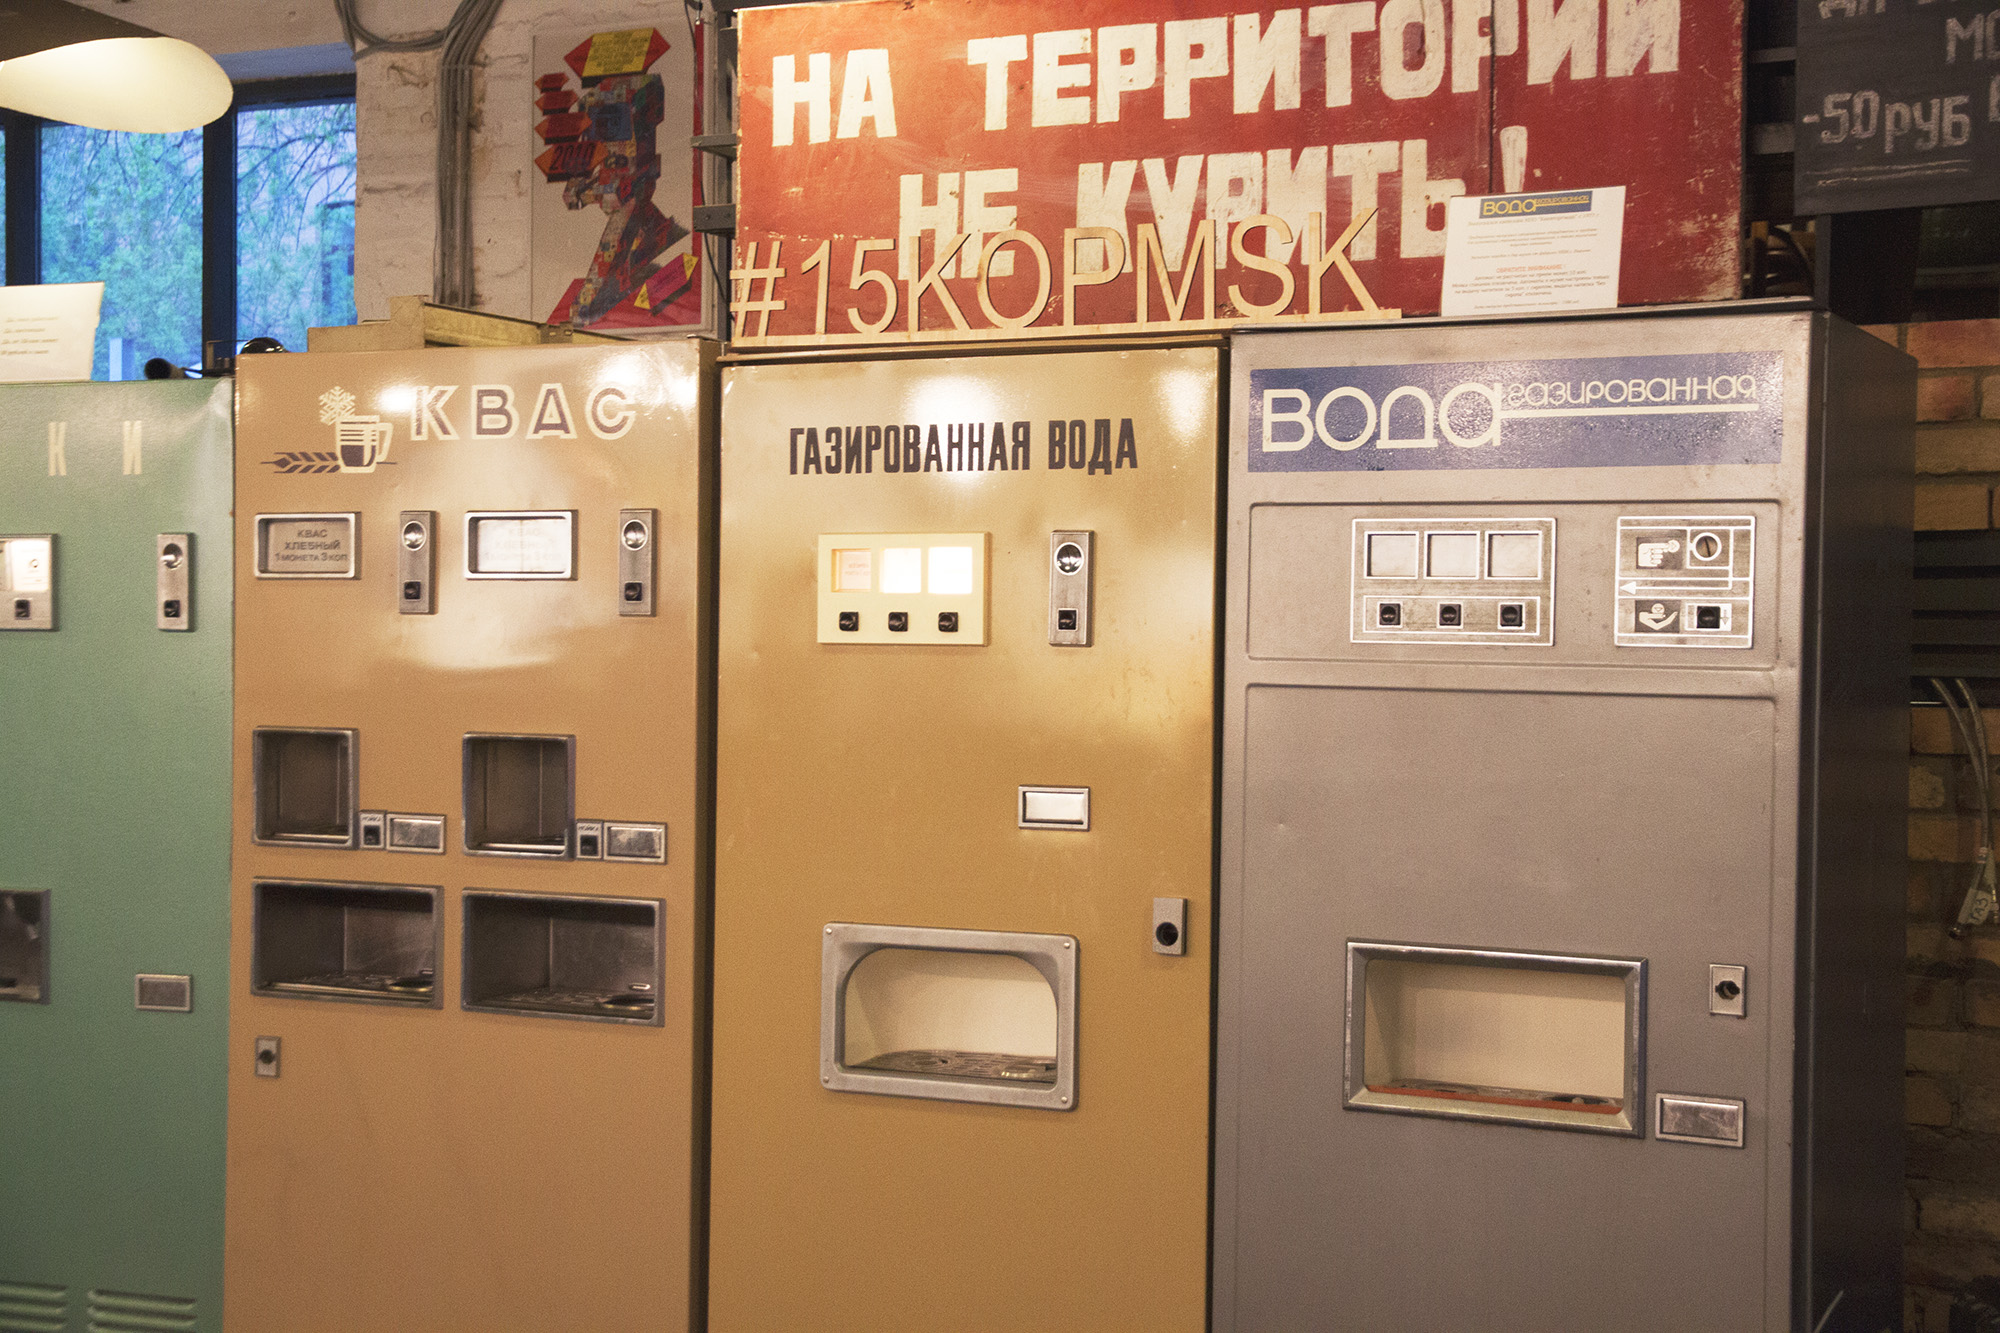 soviet machine